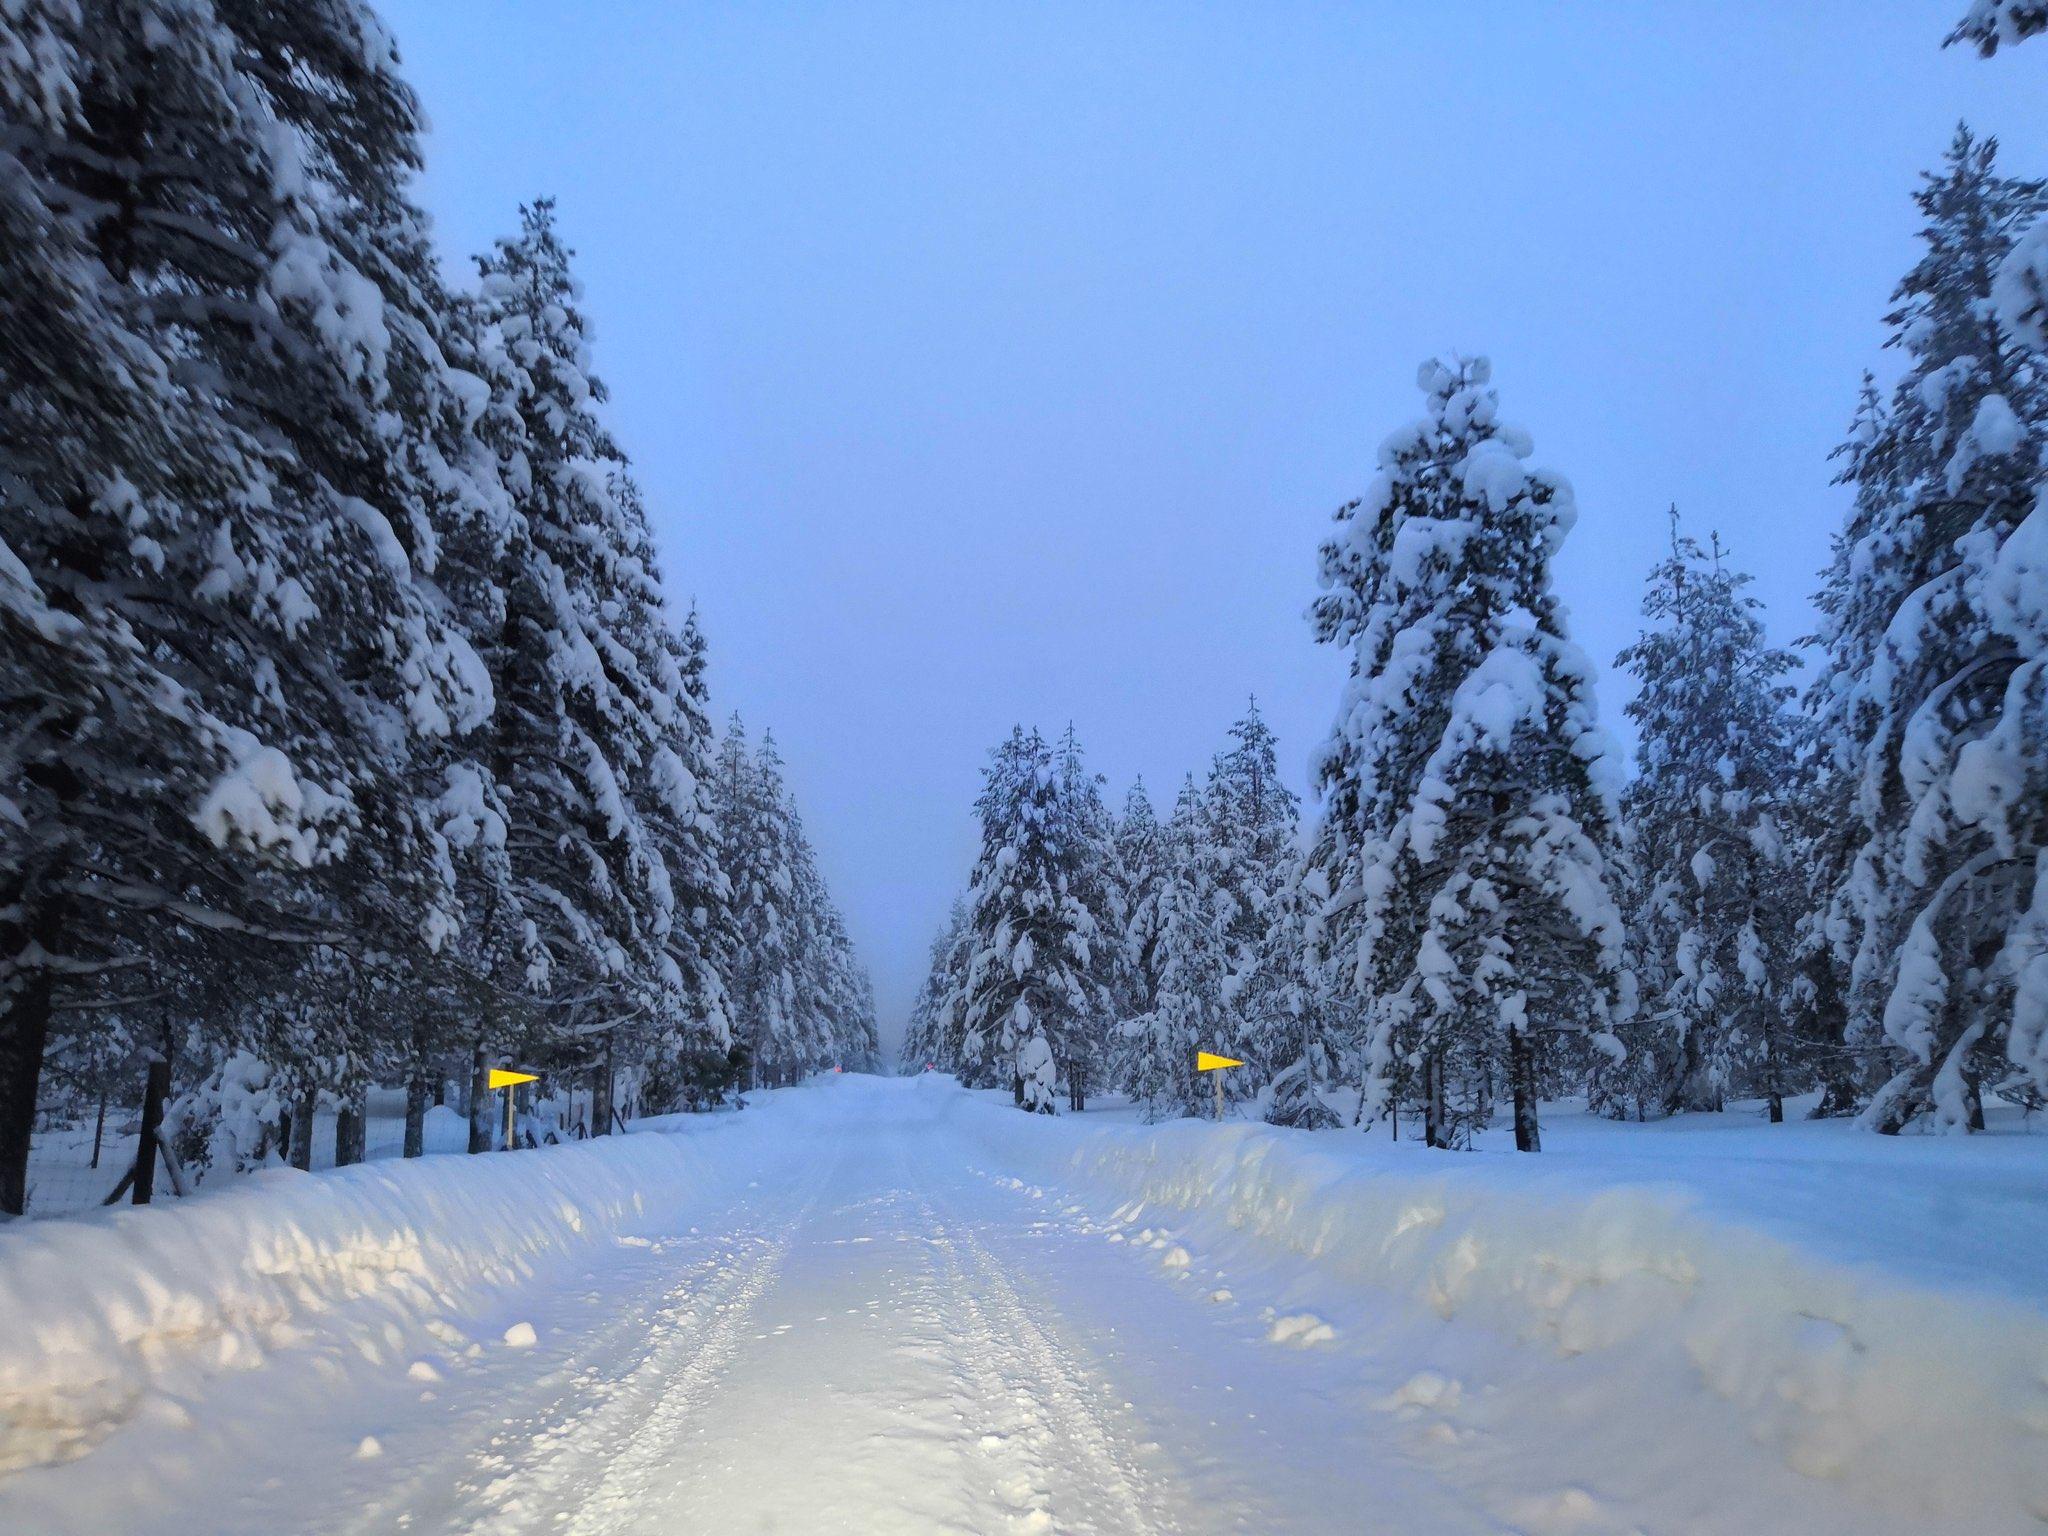 WRC: Arctic Rally Finland - Powered by CapitalBox [26-28 Febrero] - Página 3 EvJR-7NWQAAples?format=jpg&name=large